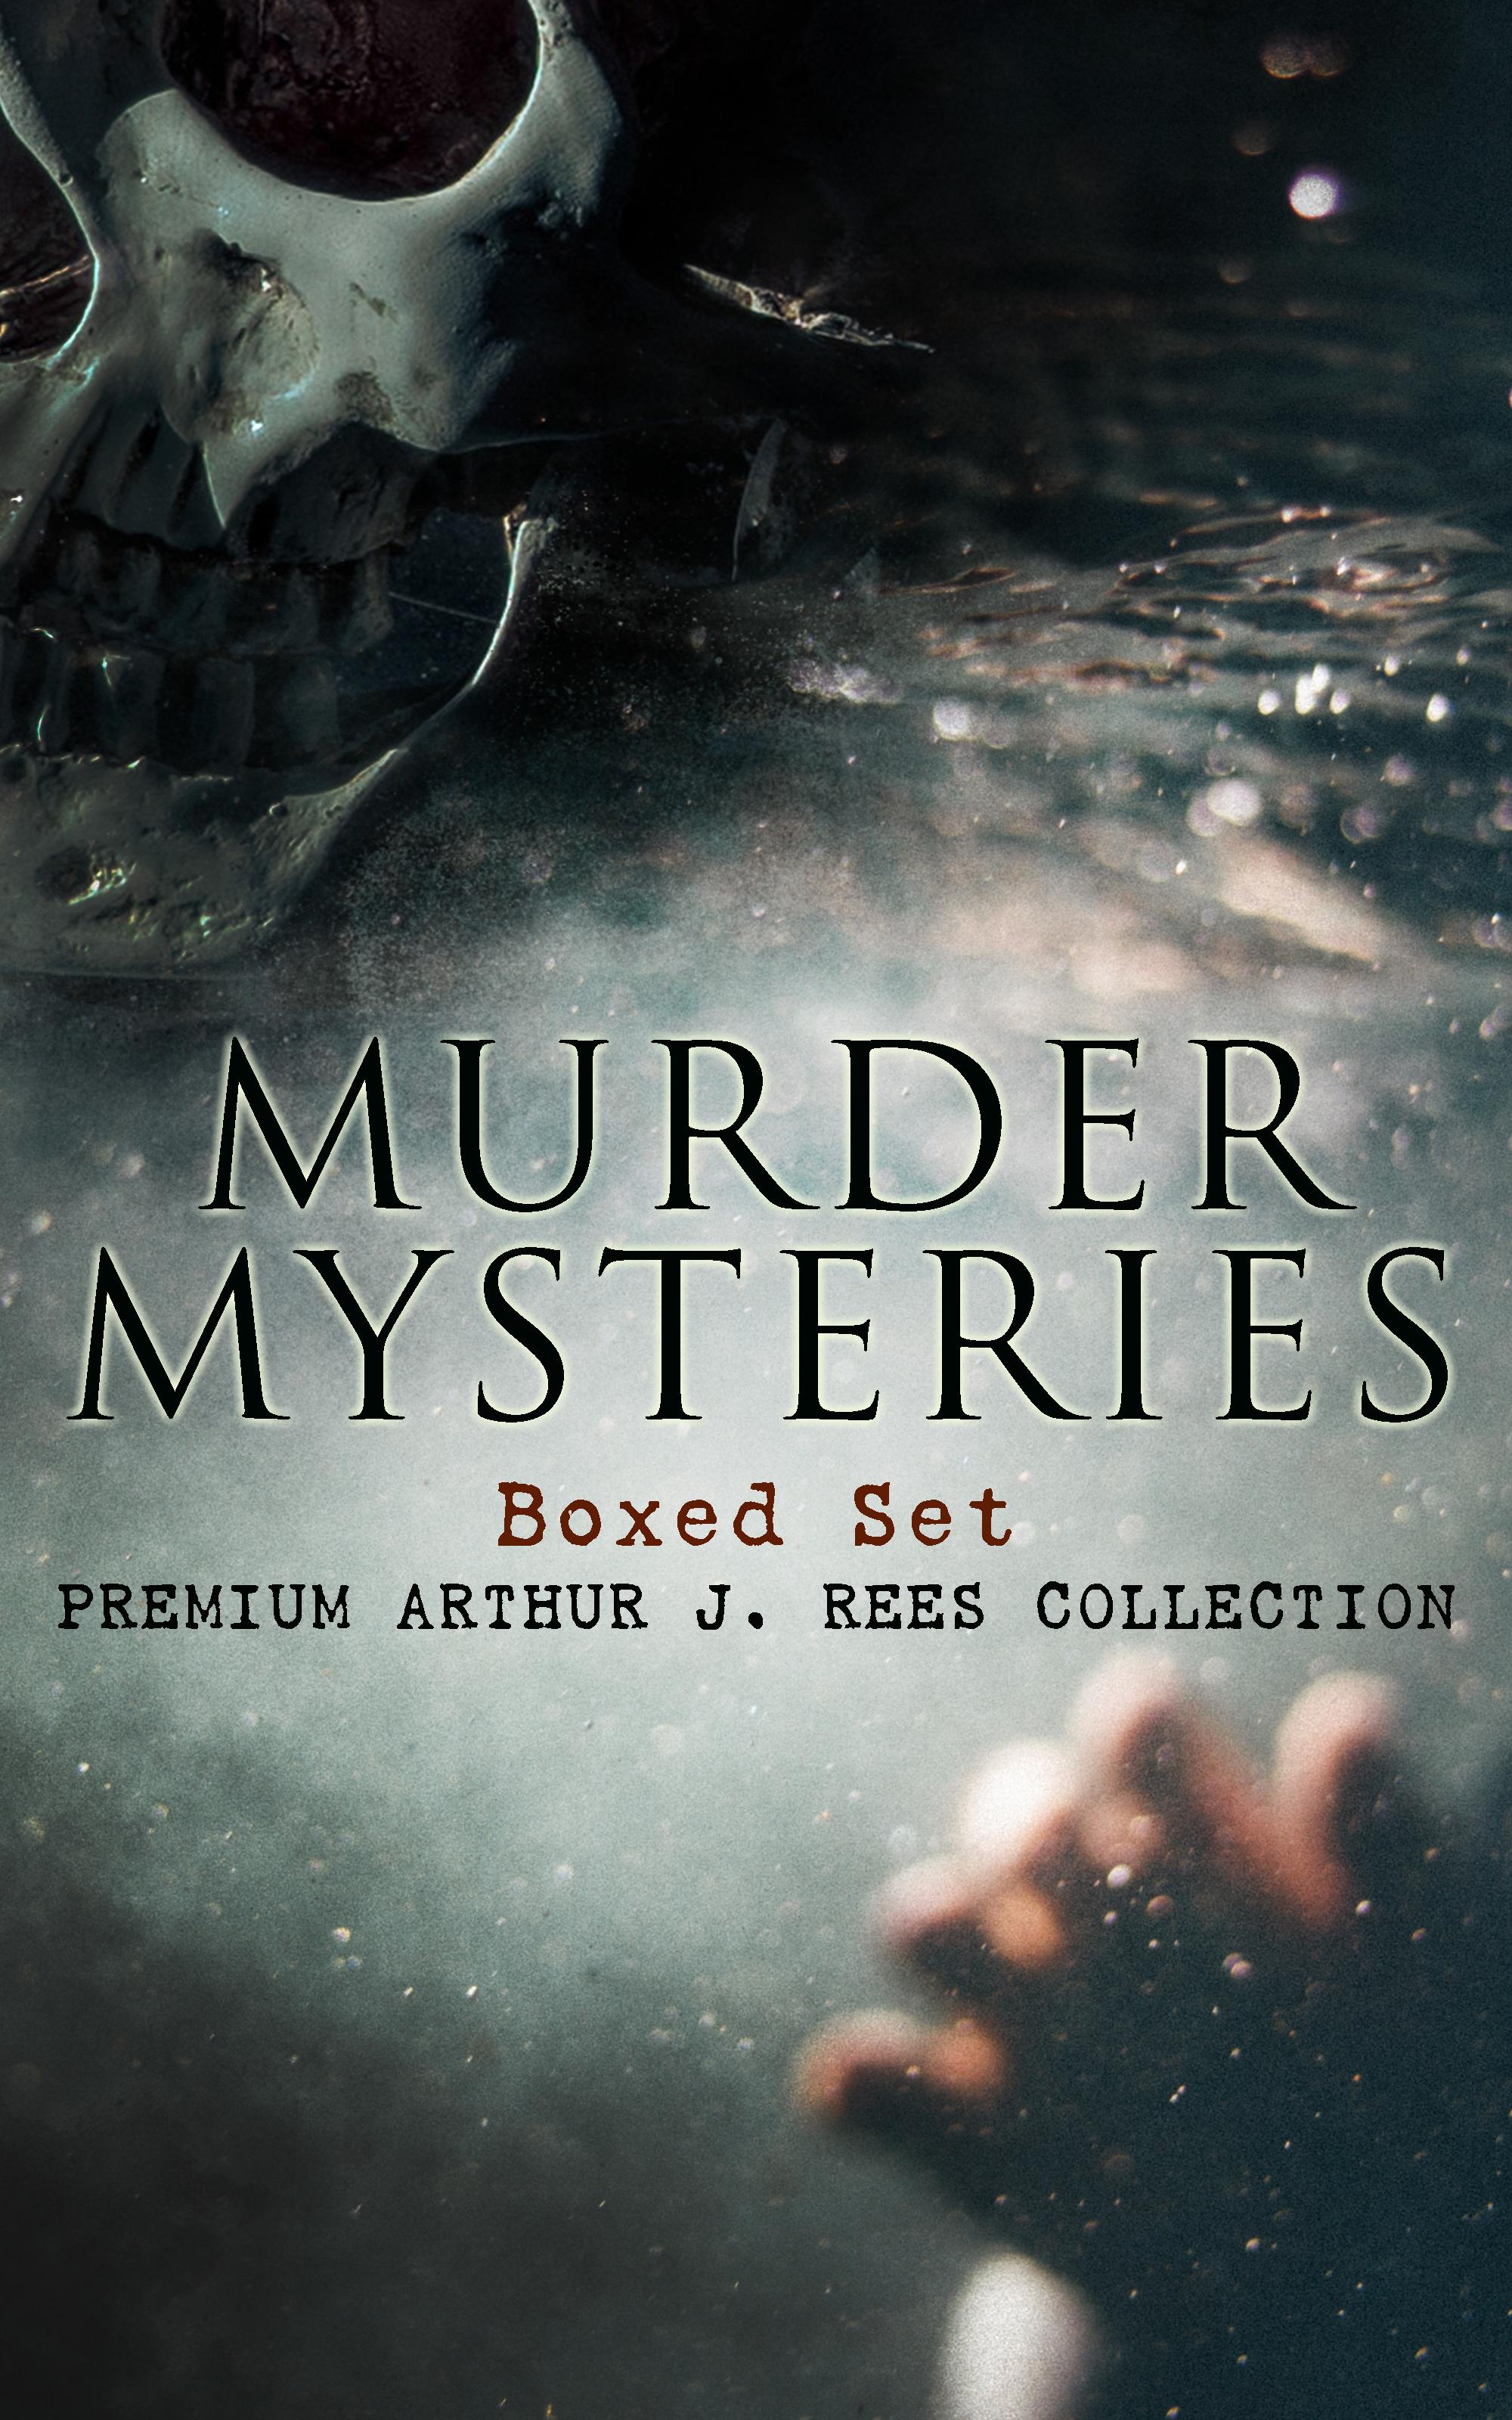 Arthur J. Rees MURDER MYSTERIES Boxed Set: Premium Arthur J. Rees Collection цена и фото